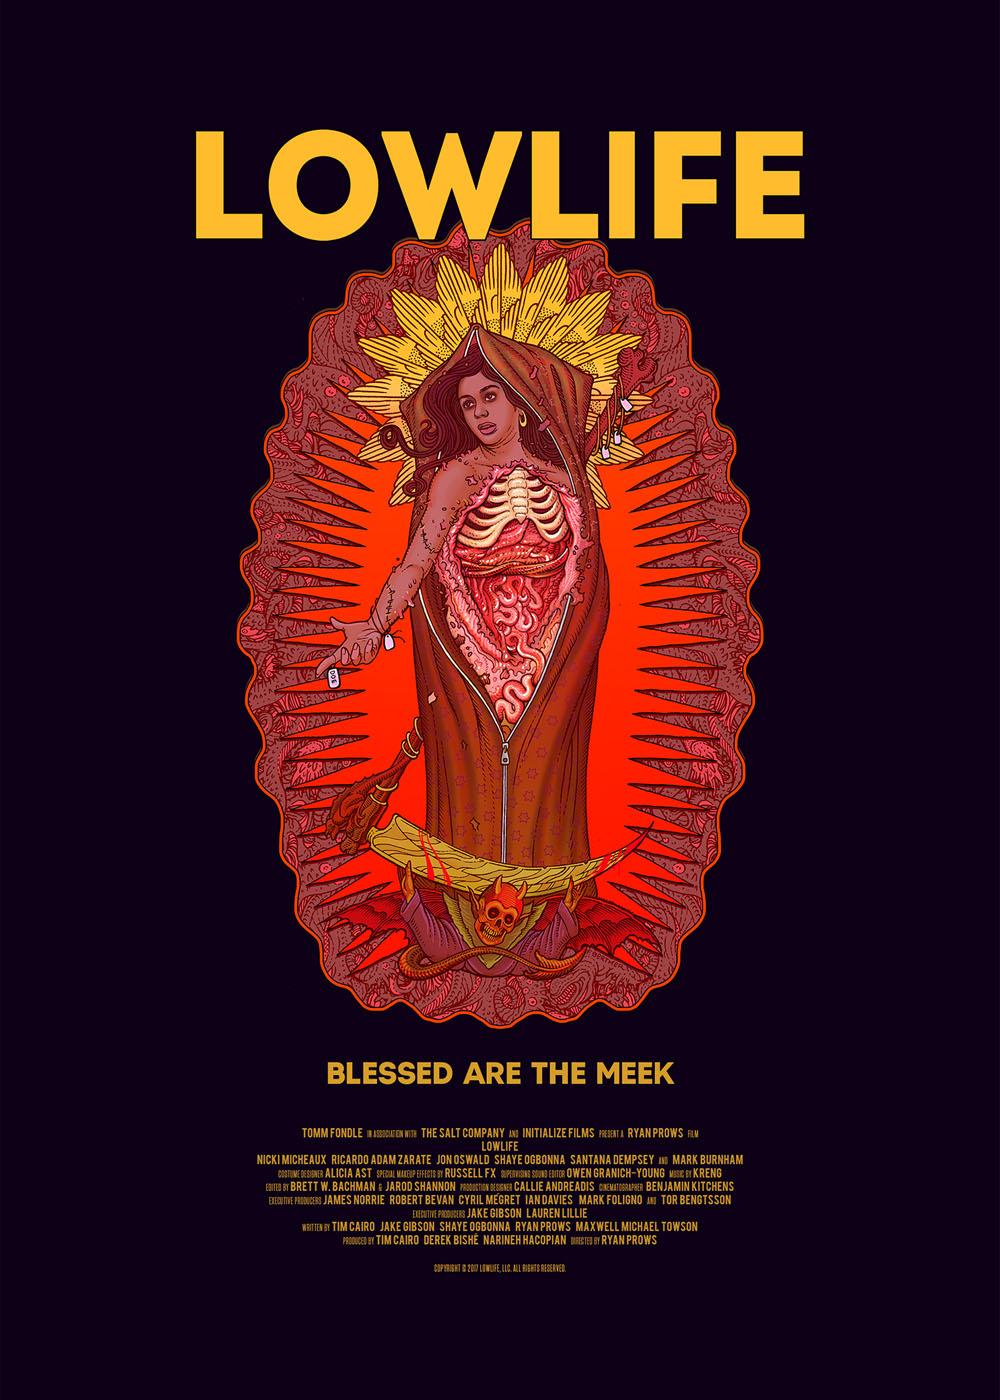 Lowlife-Poster.jpg